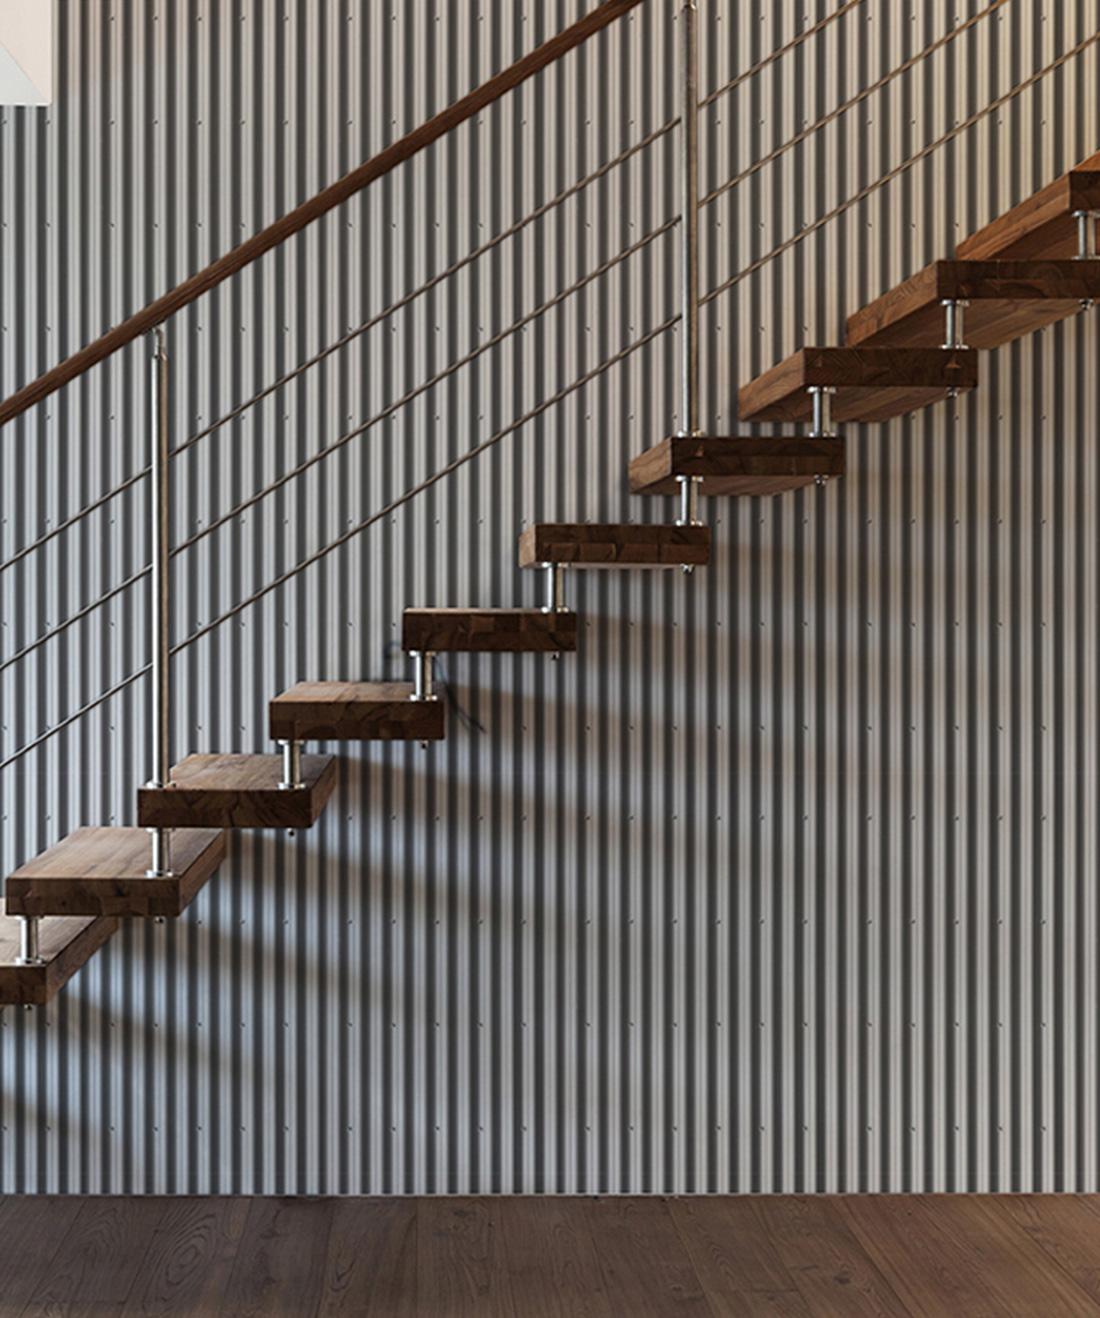 Corrugated Iron • Metal Wallpaper • Industrial Wallpaper